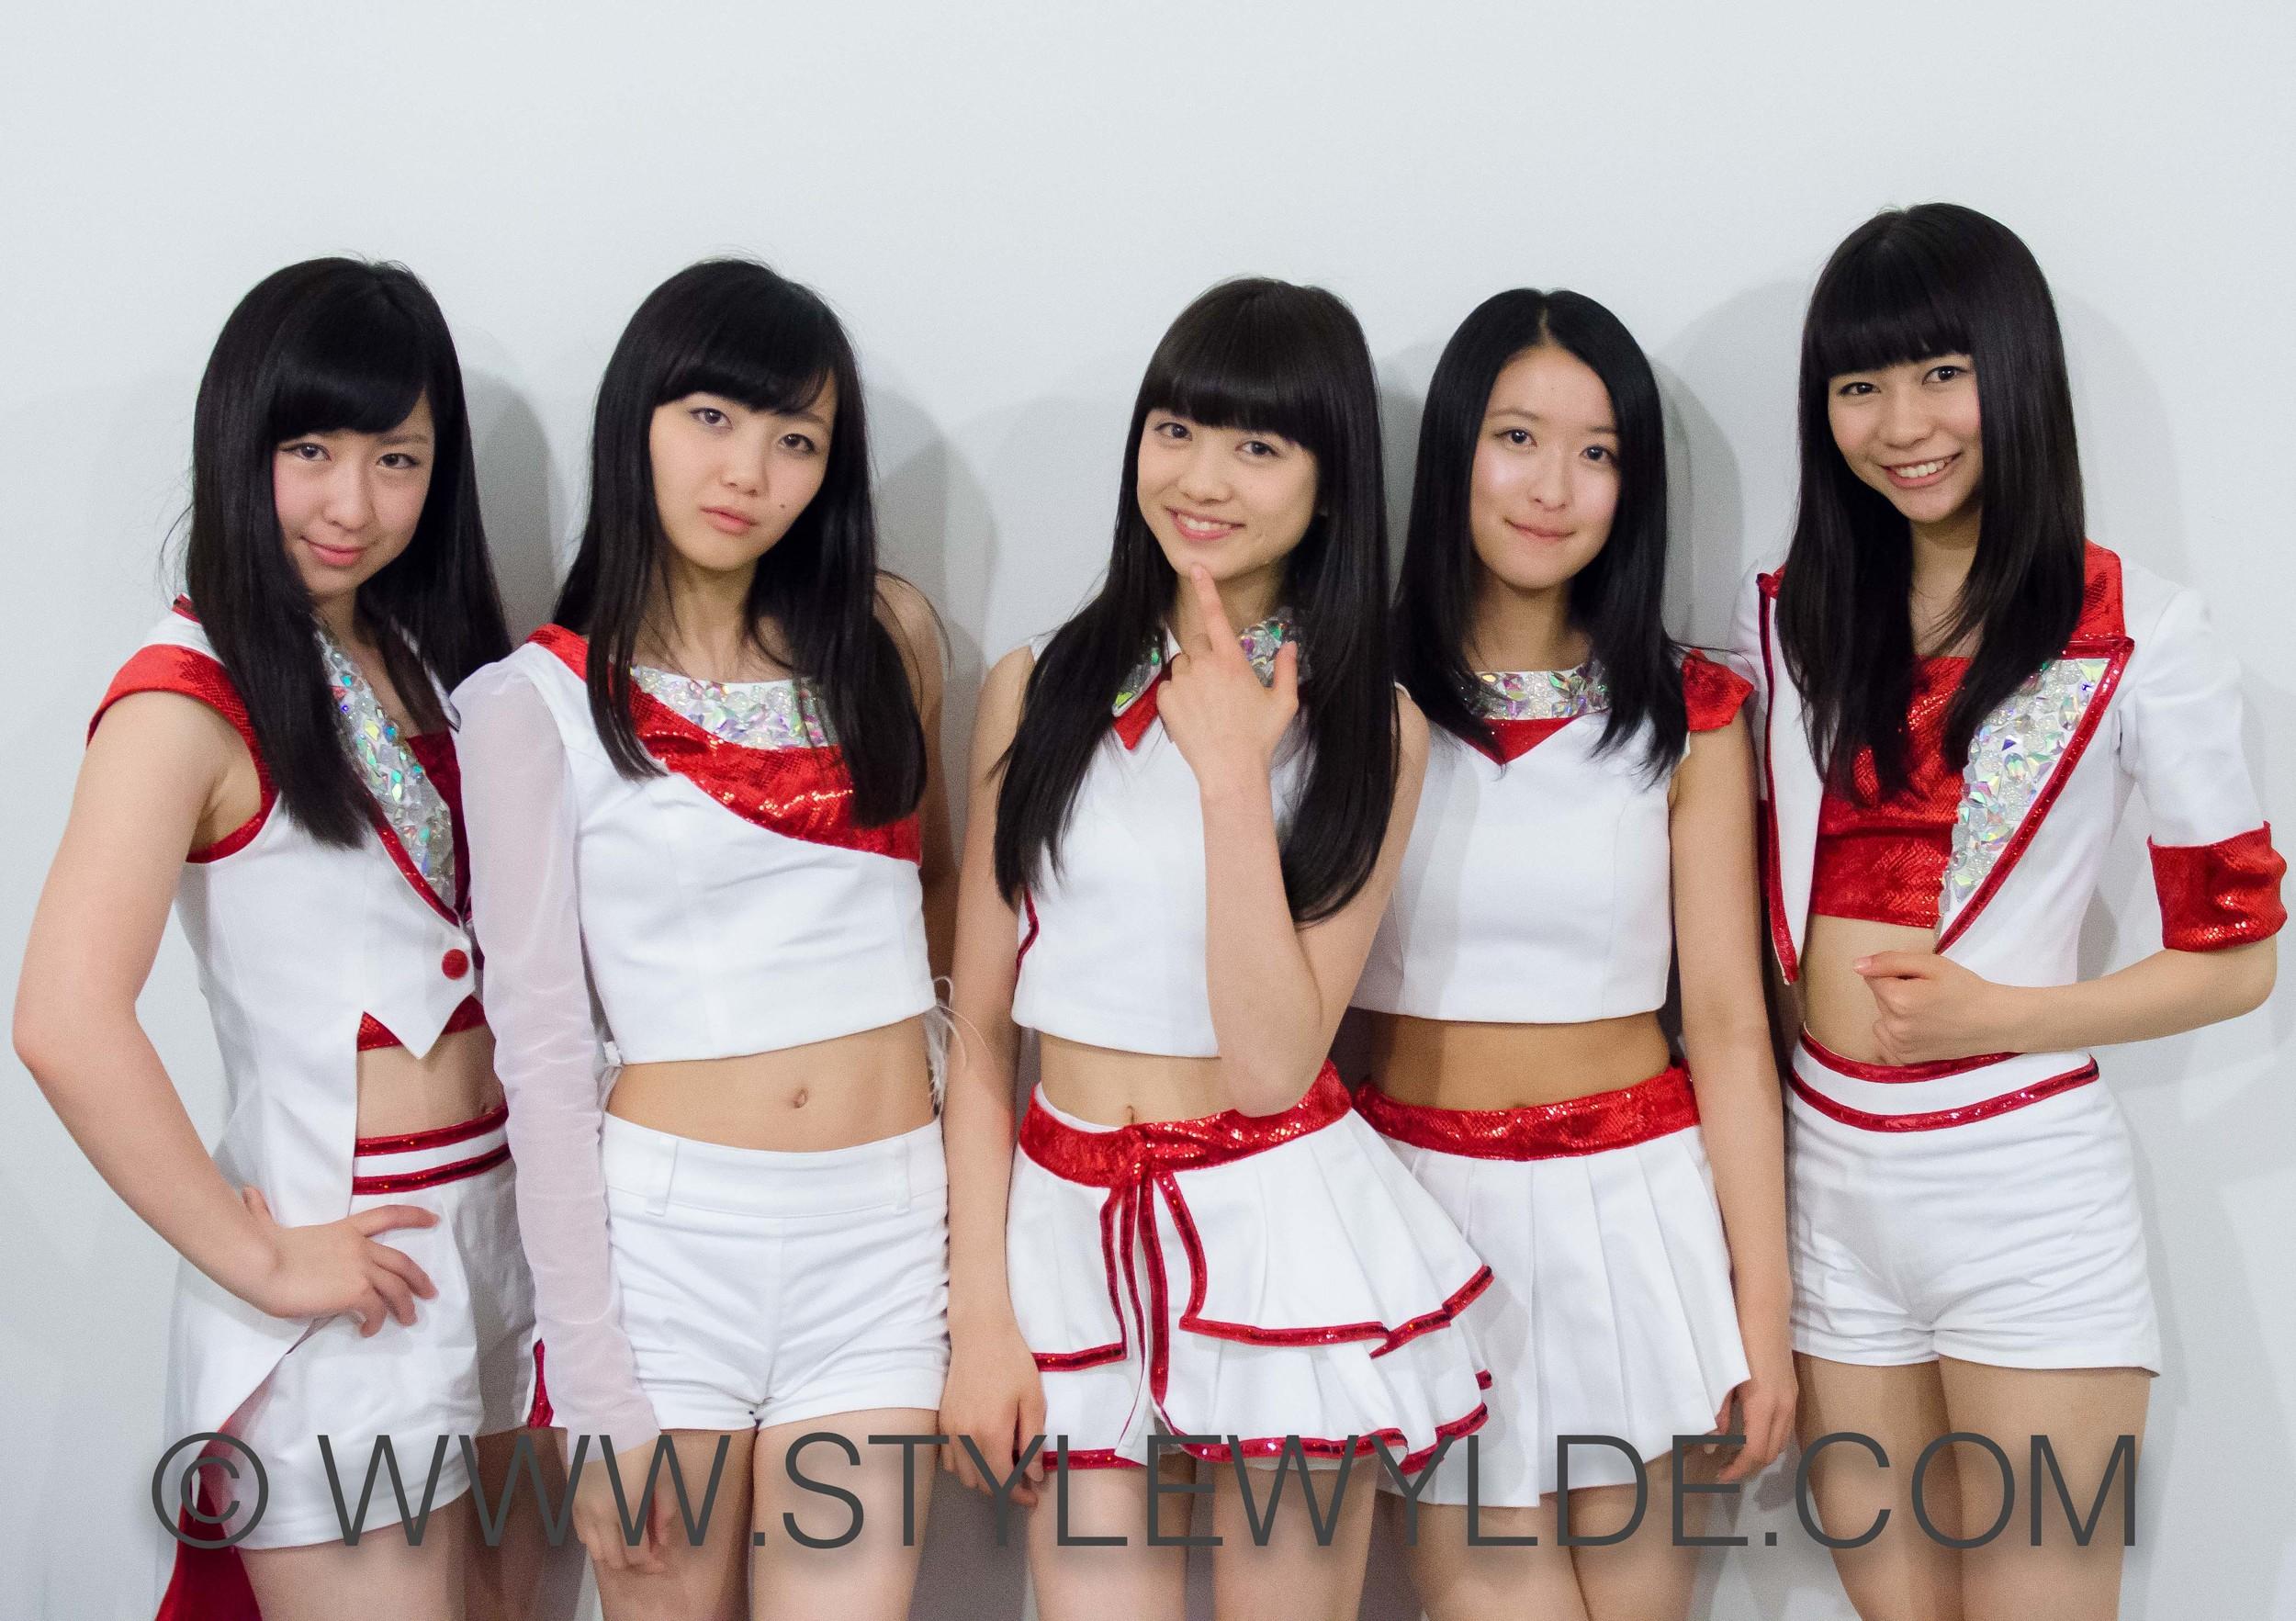 Tokyo Girls Style from left to right: Ayano Konishi, Miyu Yamabe, Hitomi Arai, Yuri Nakae and Mei Shyoji